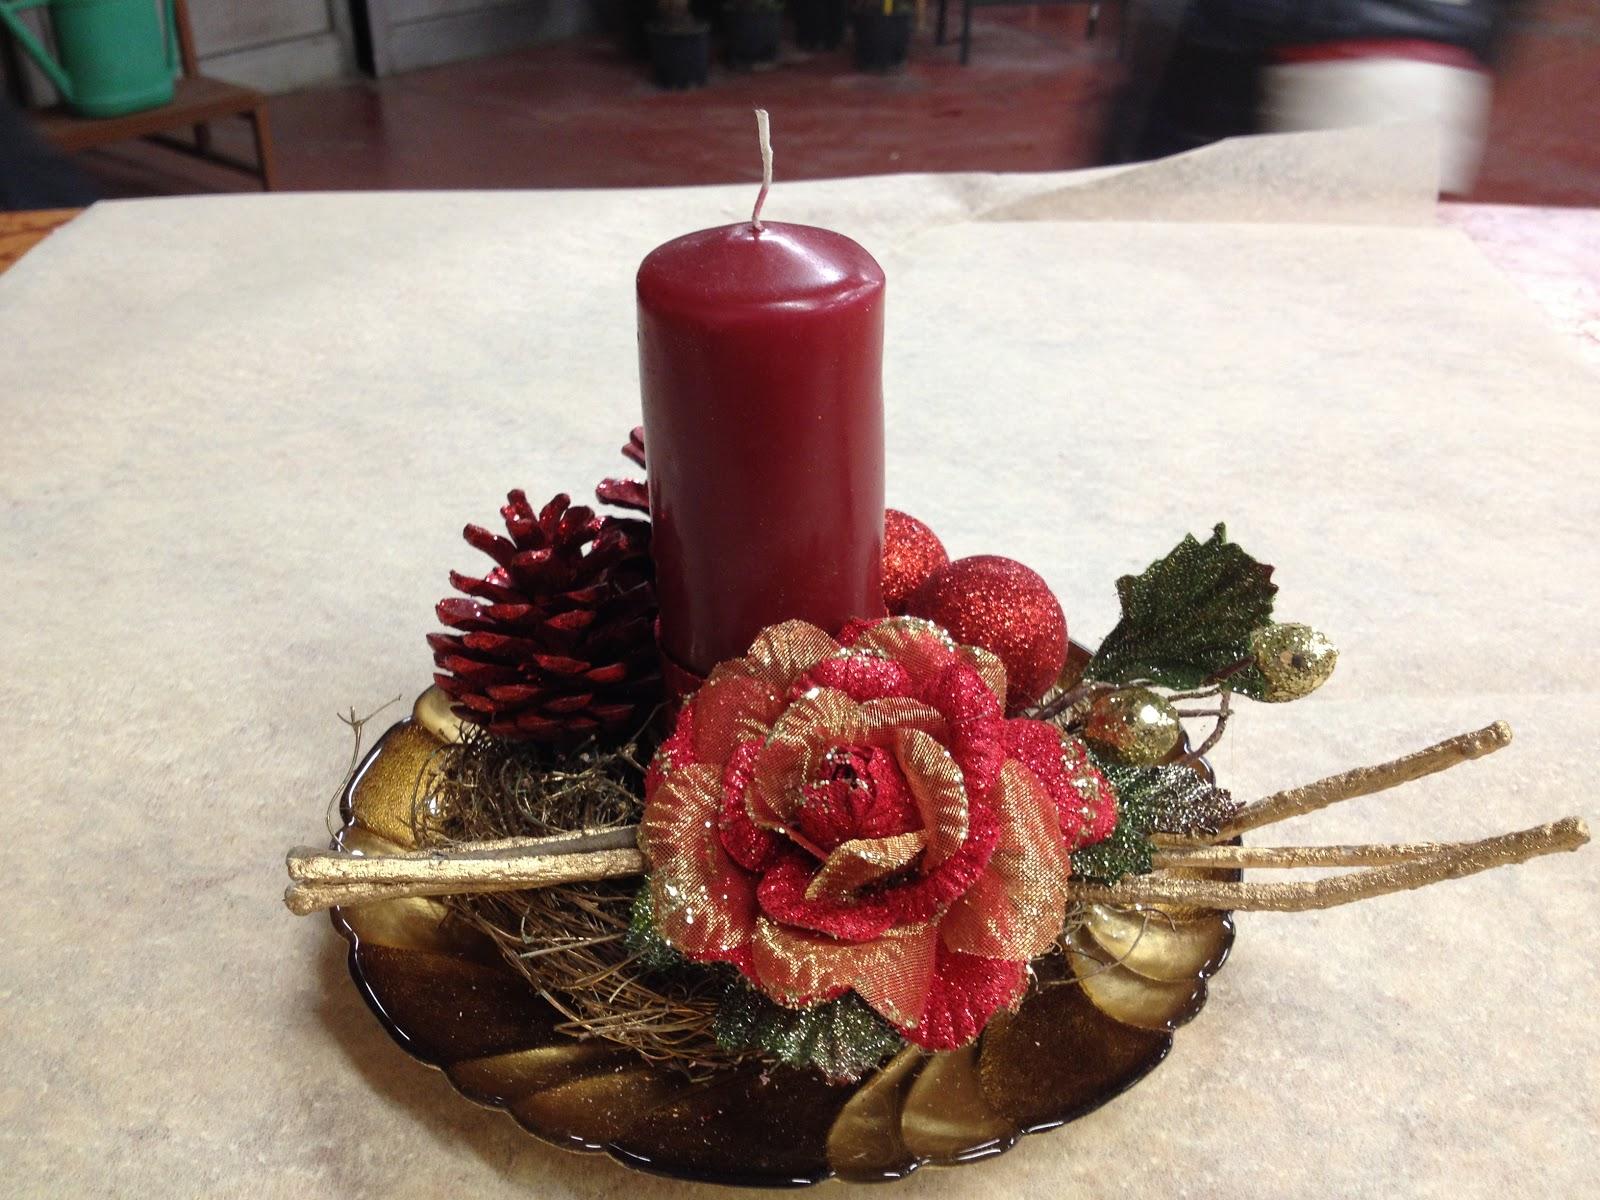 Giada passione creativa centrotavola natalizi - Centrotavola natalizi ...